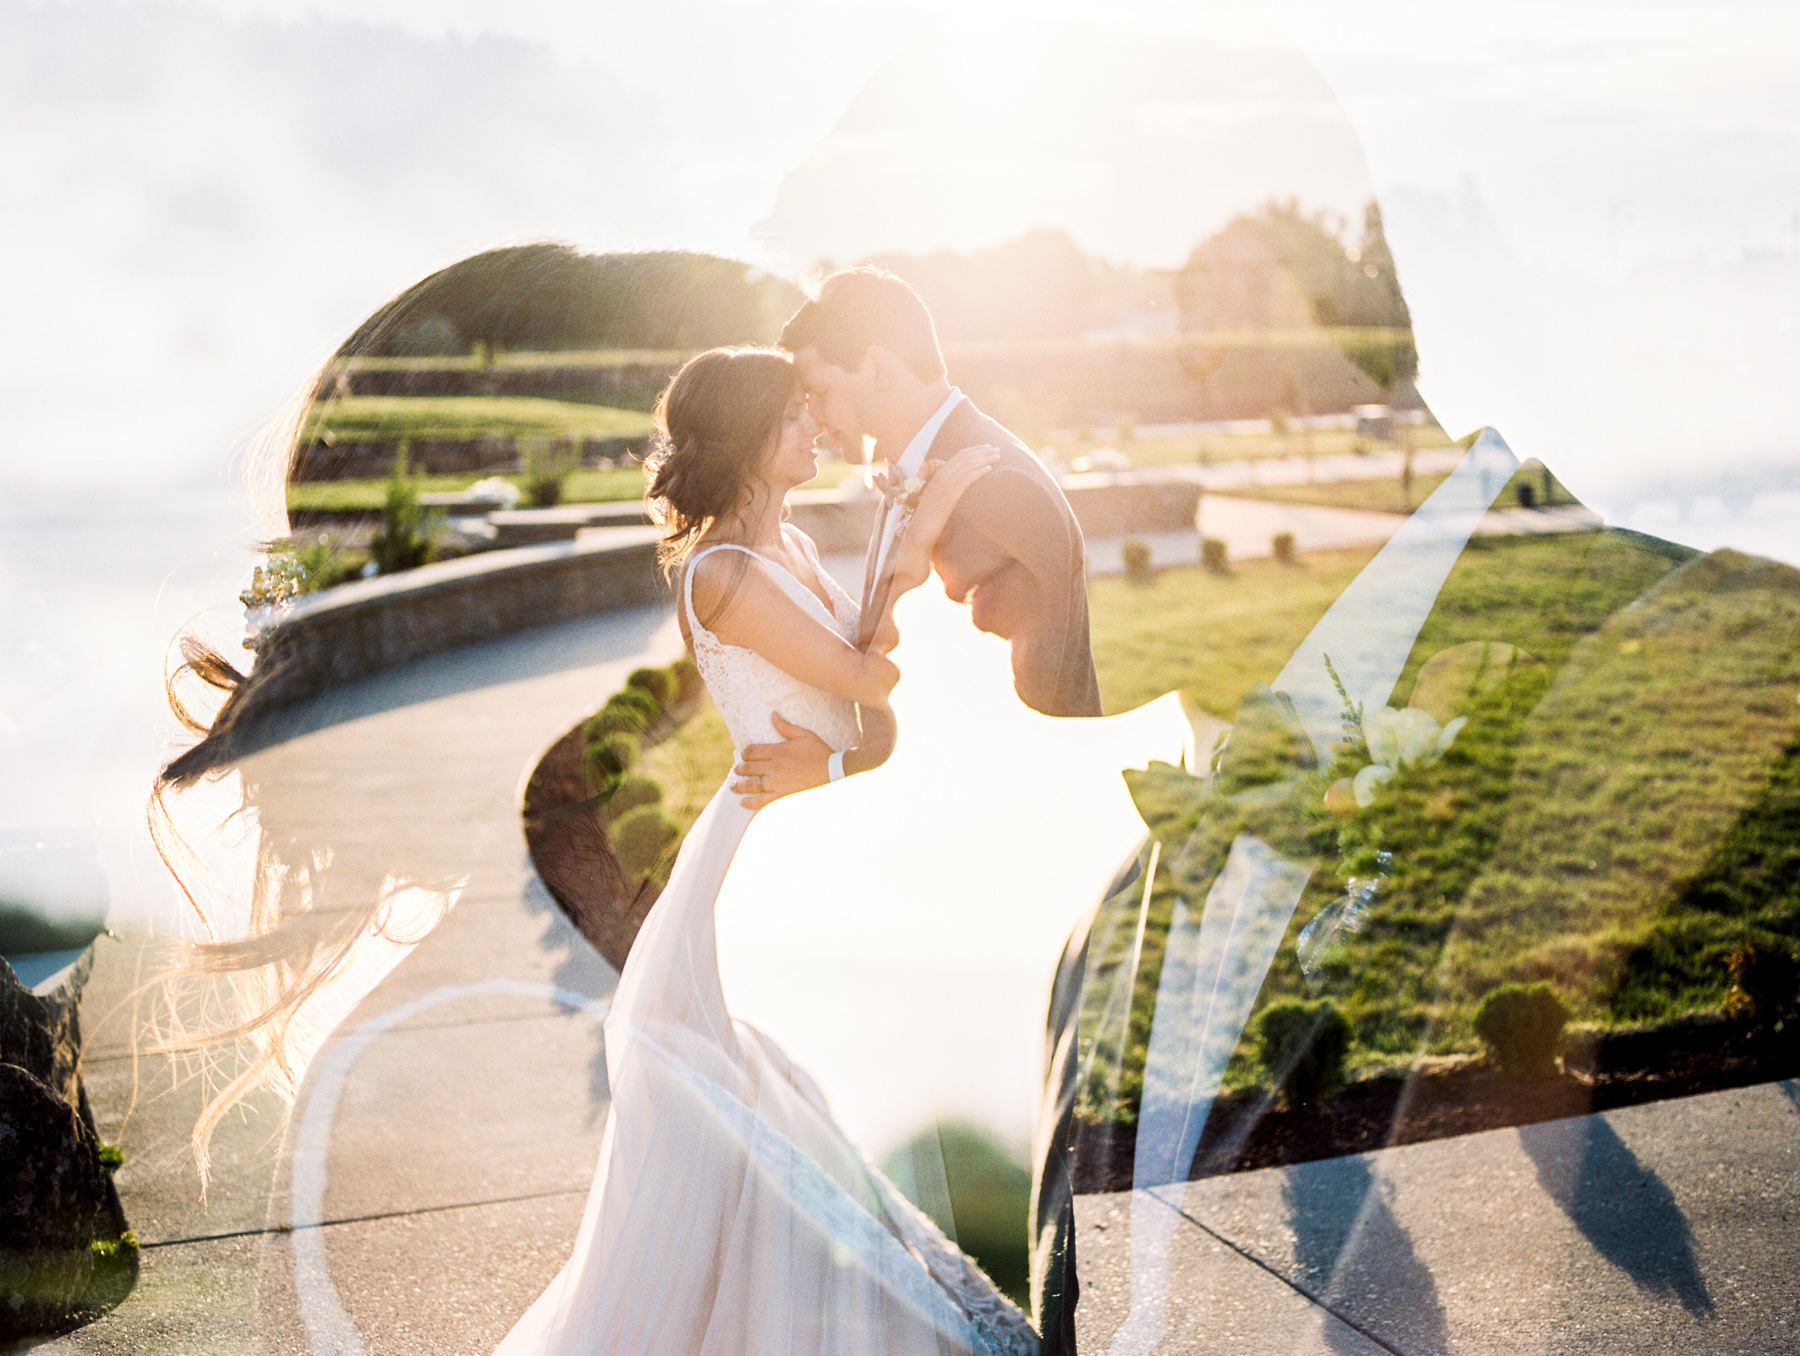 Ben+Joella_Marriage_32.jpg